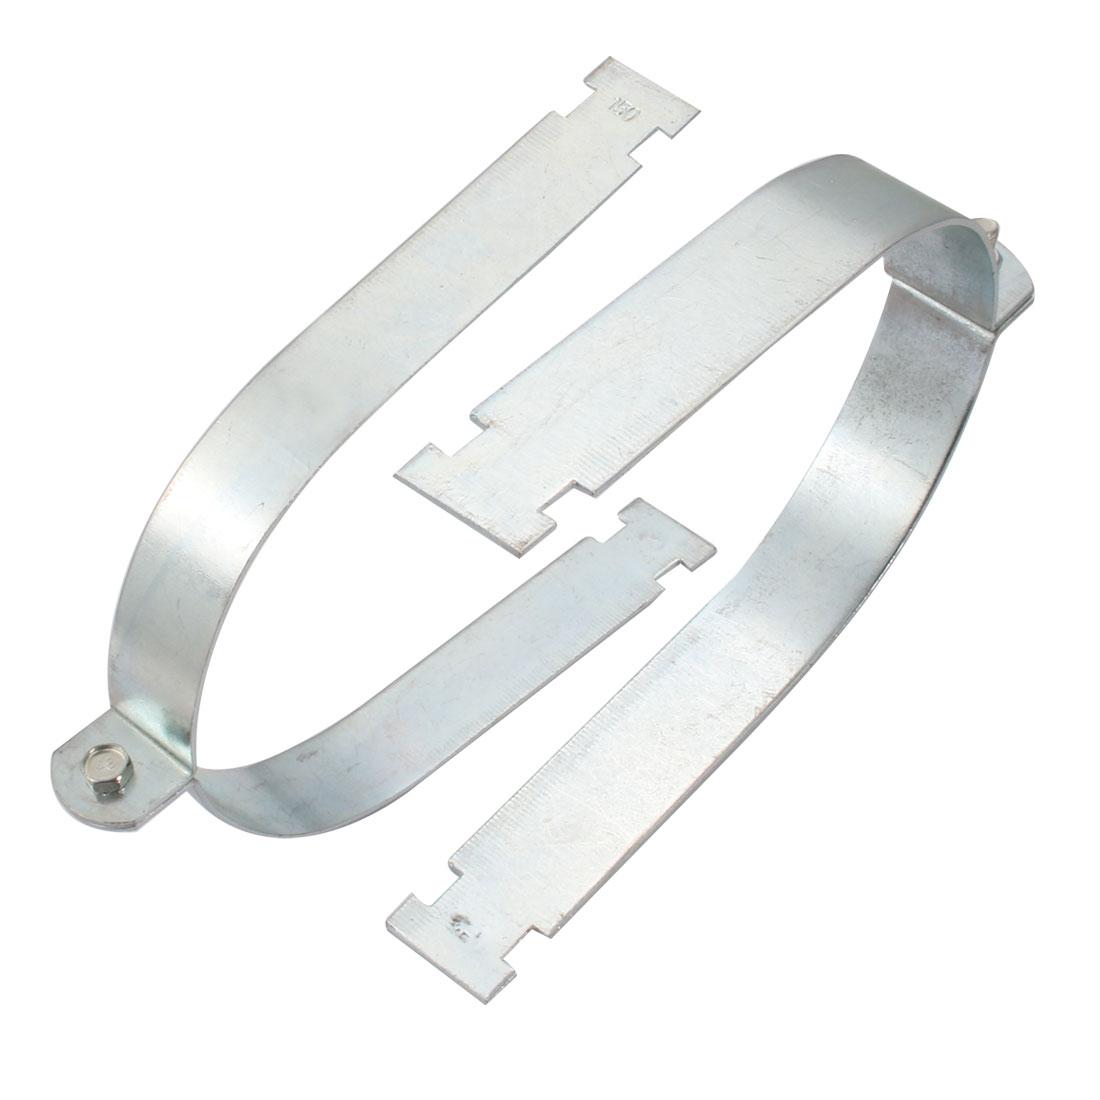 2Pcs Rigid Steel Conduit Strut Mounted Clamp for 150mm Nominal Diameter Tube